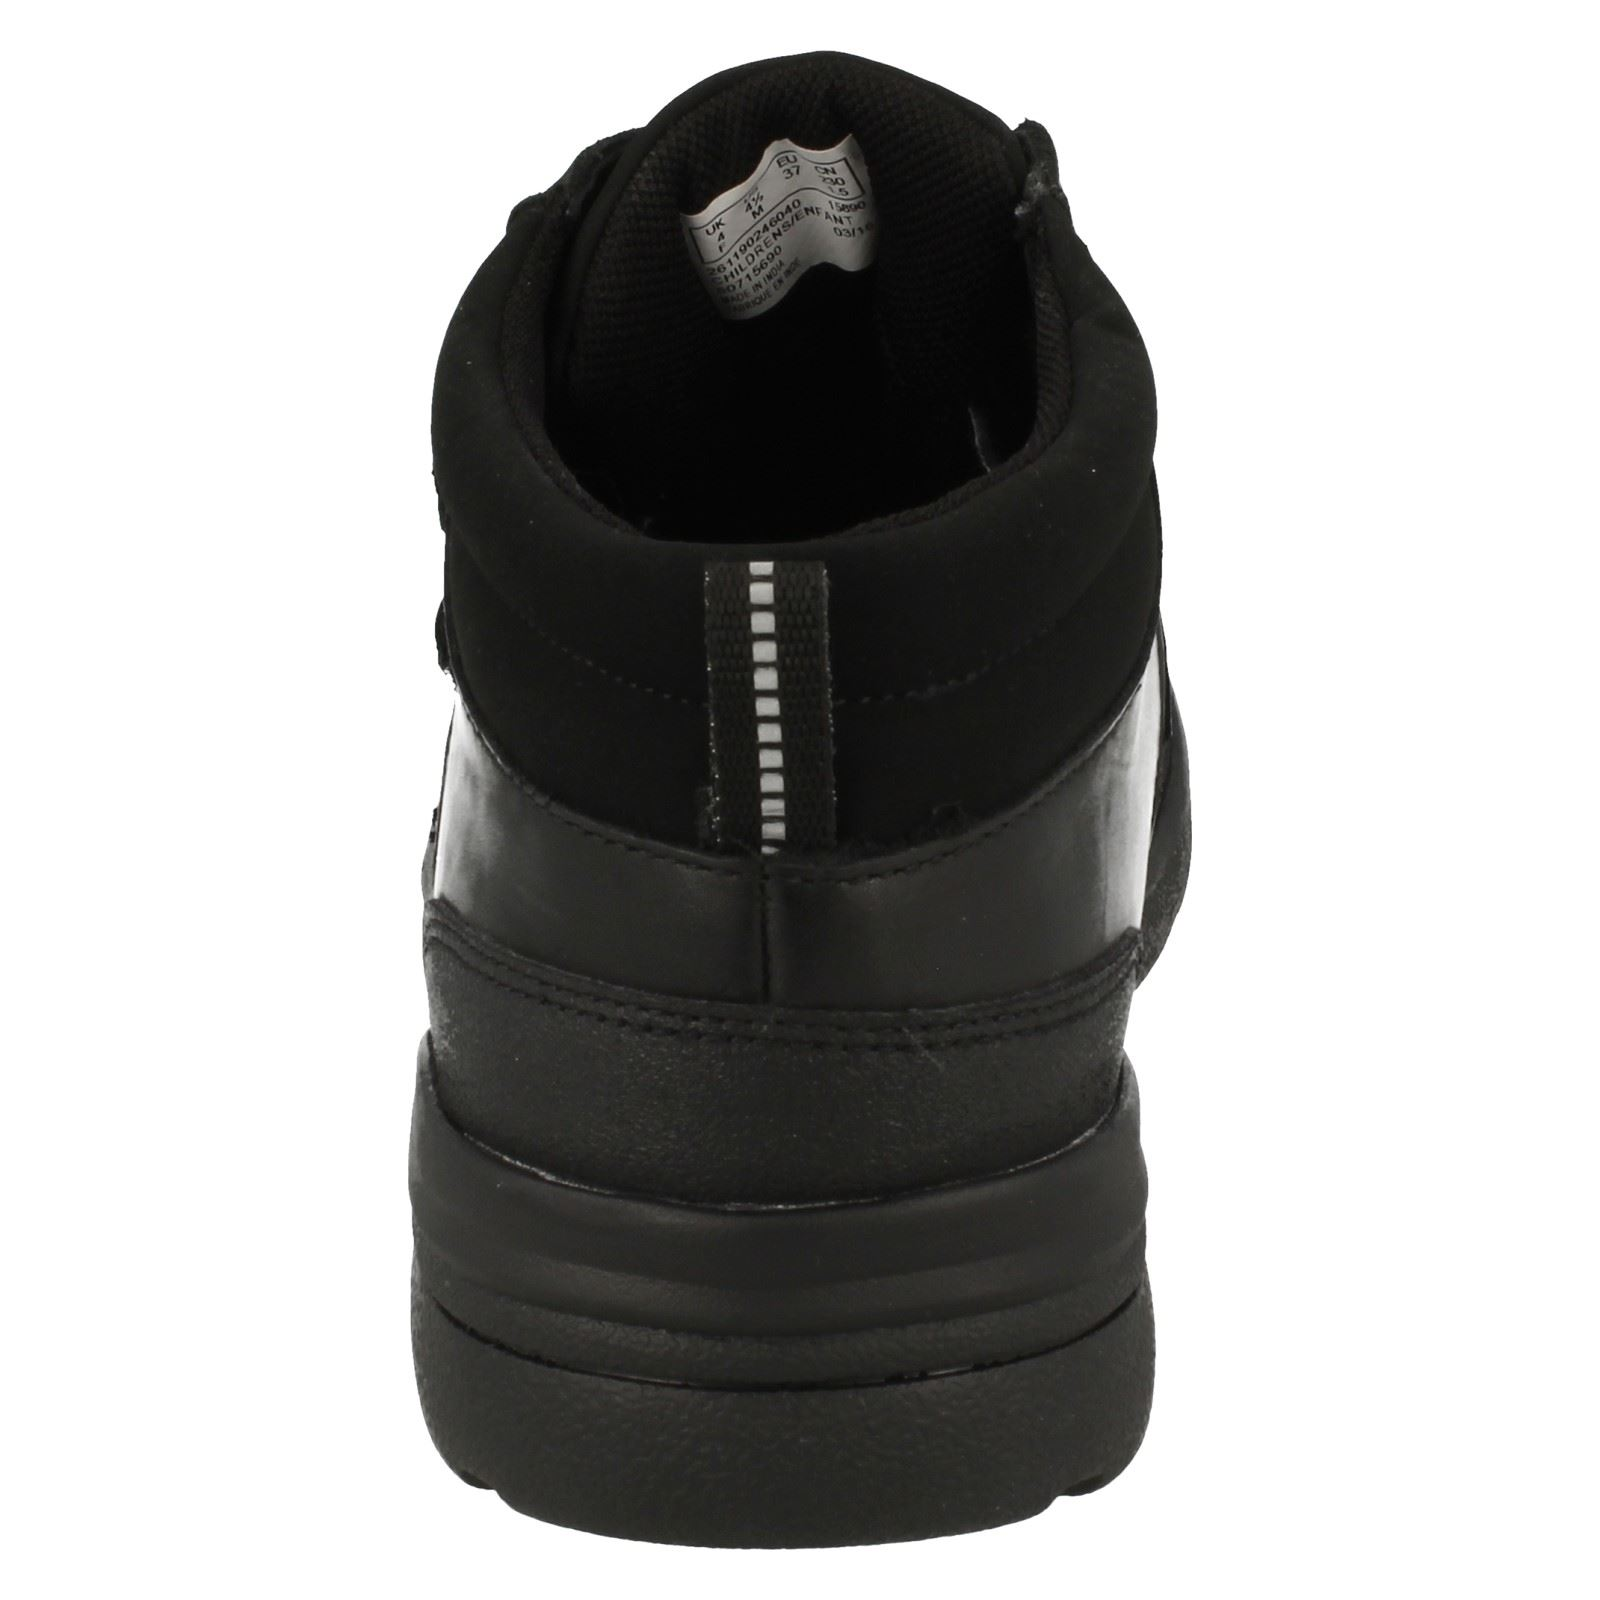 "Boys Clarks Formal Ankle Boots /""Loris Top GTX/"""